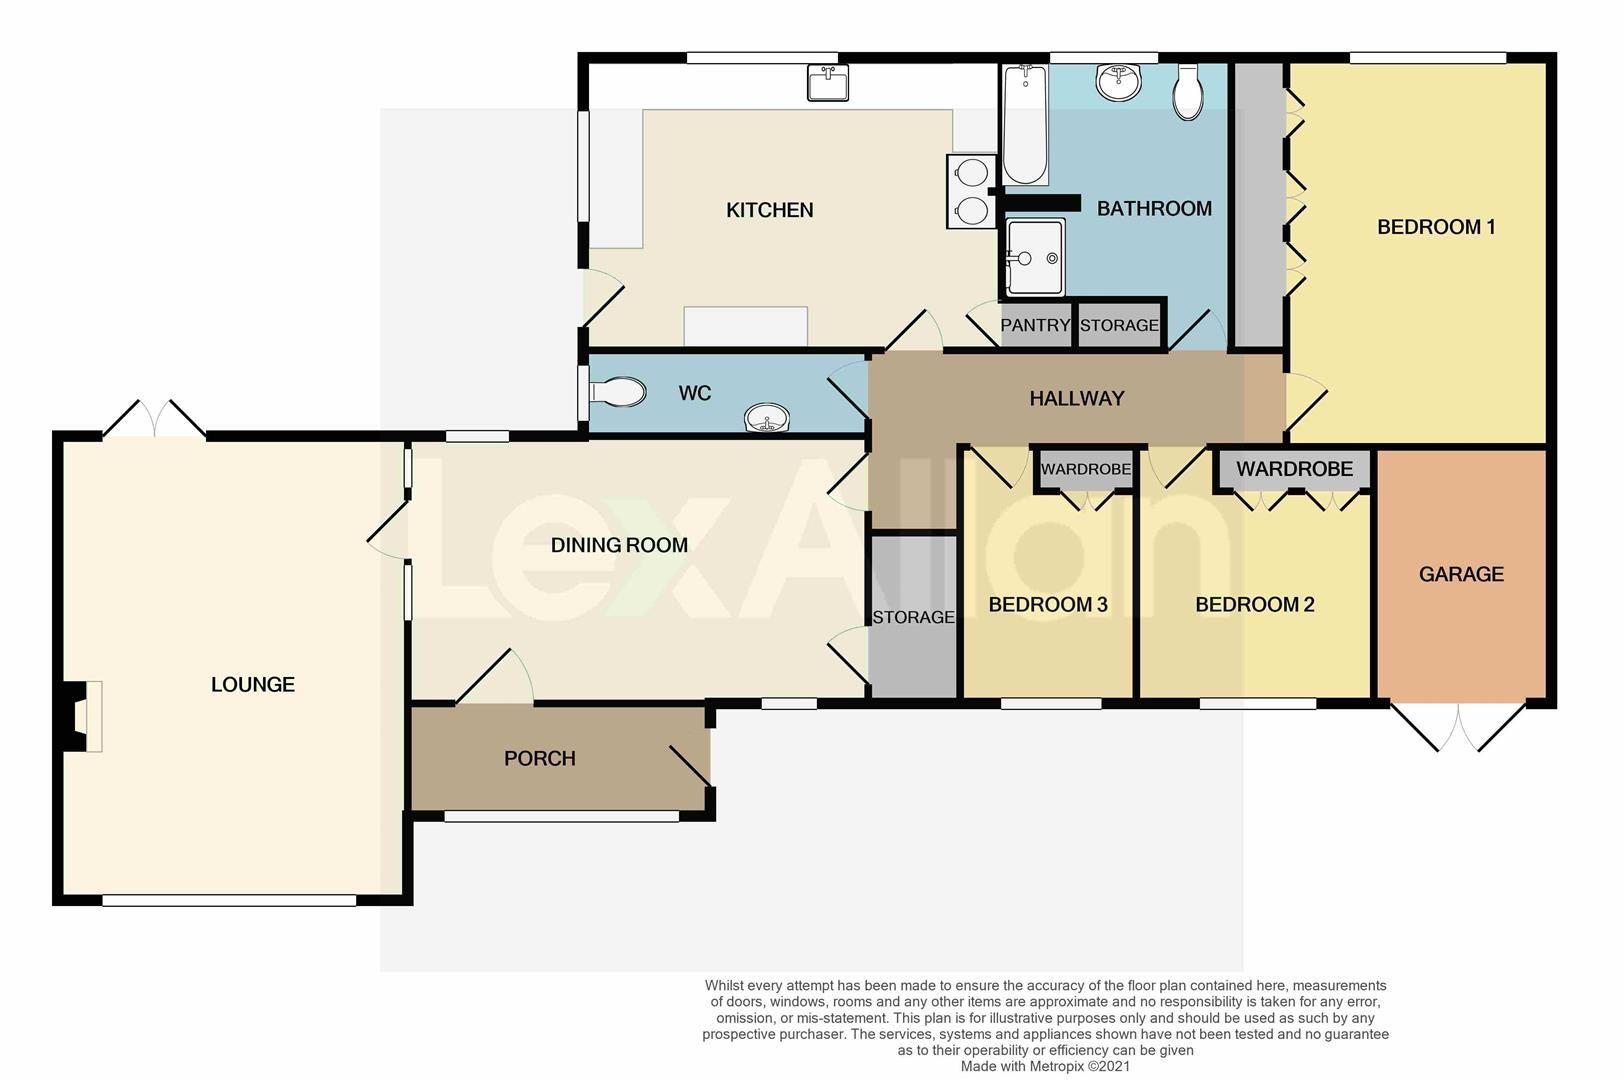 3 bed detached-bungalow for sale - Property Floorplan